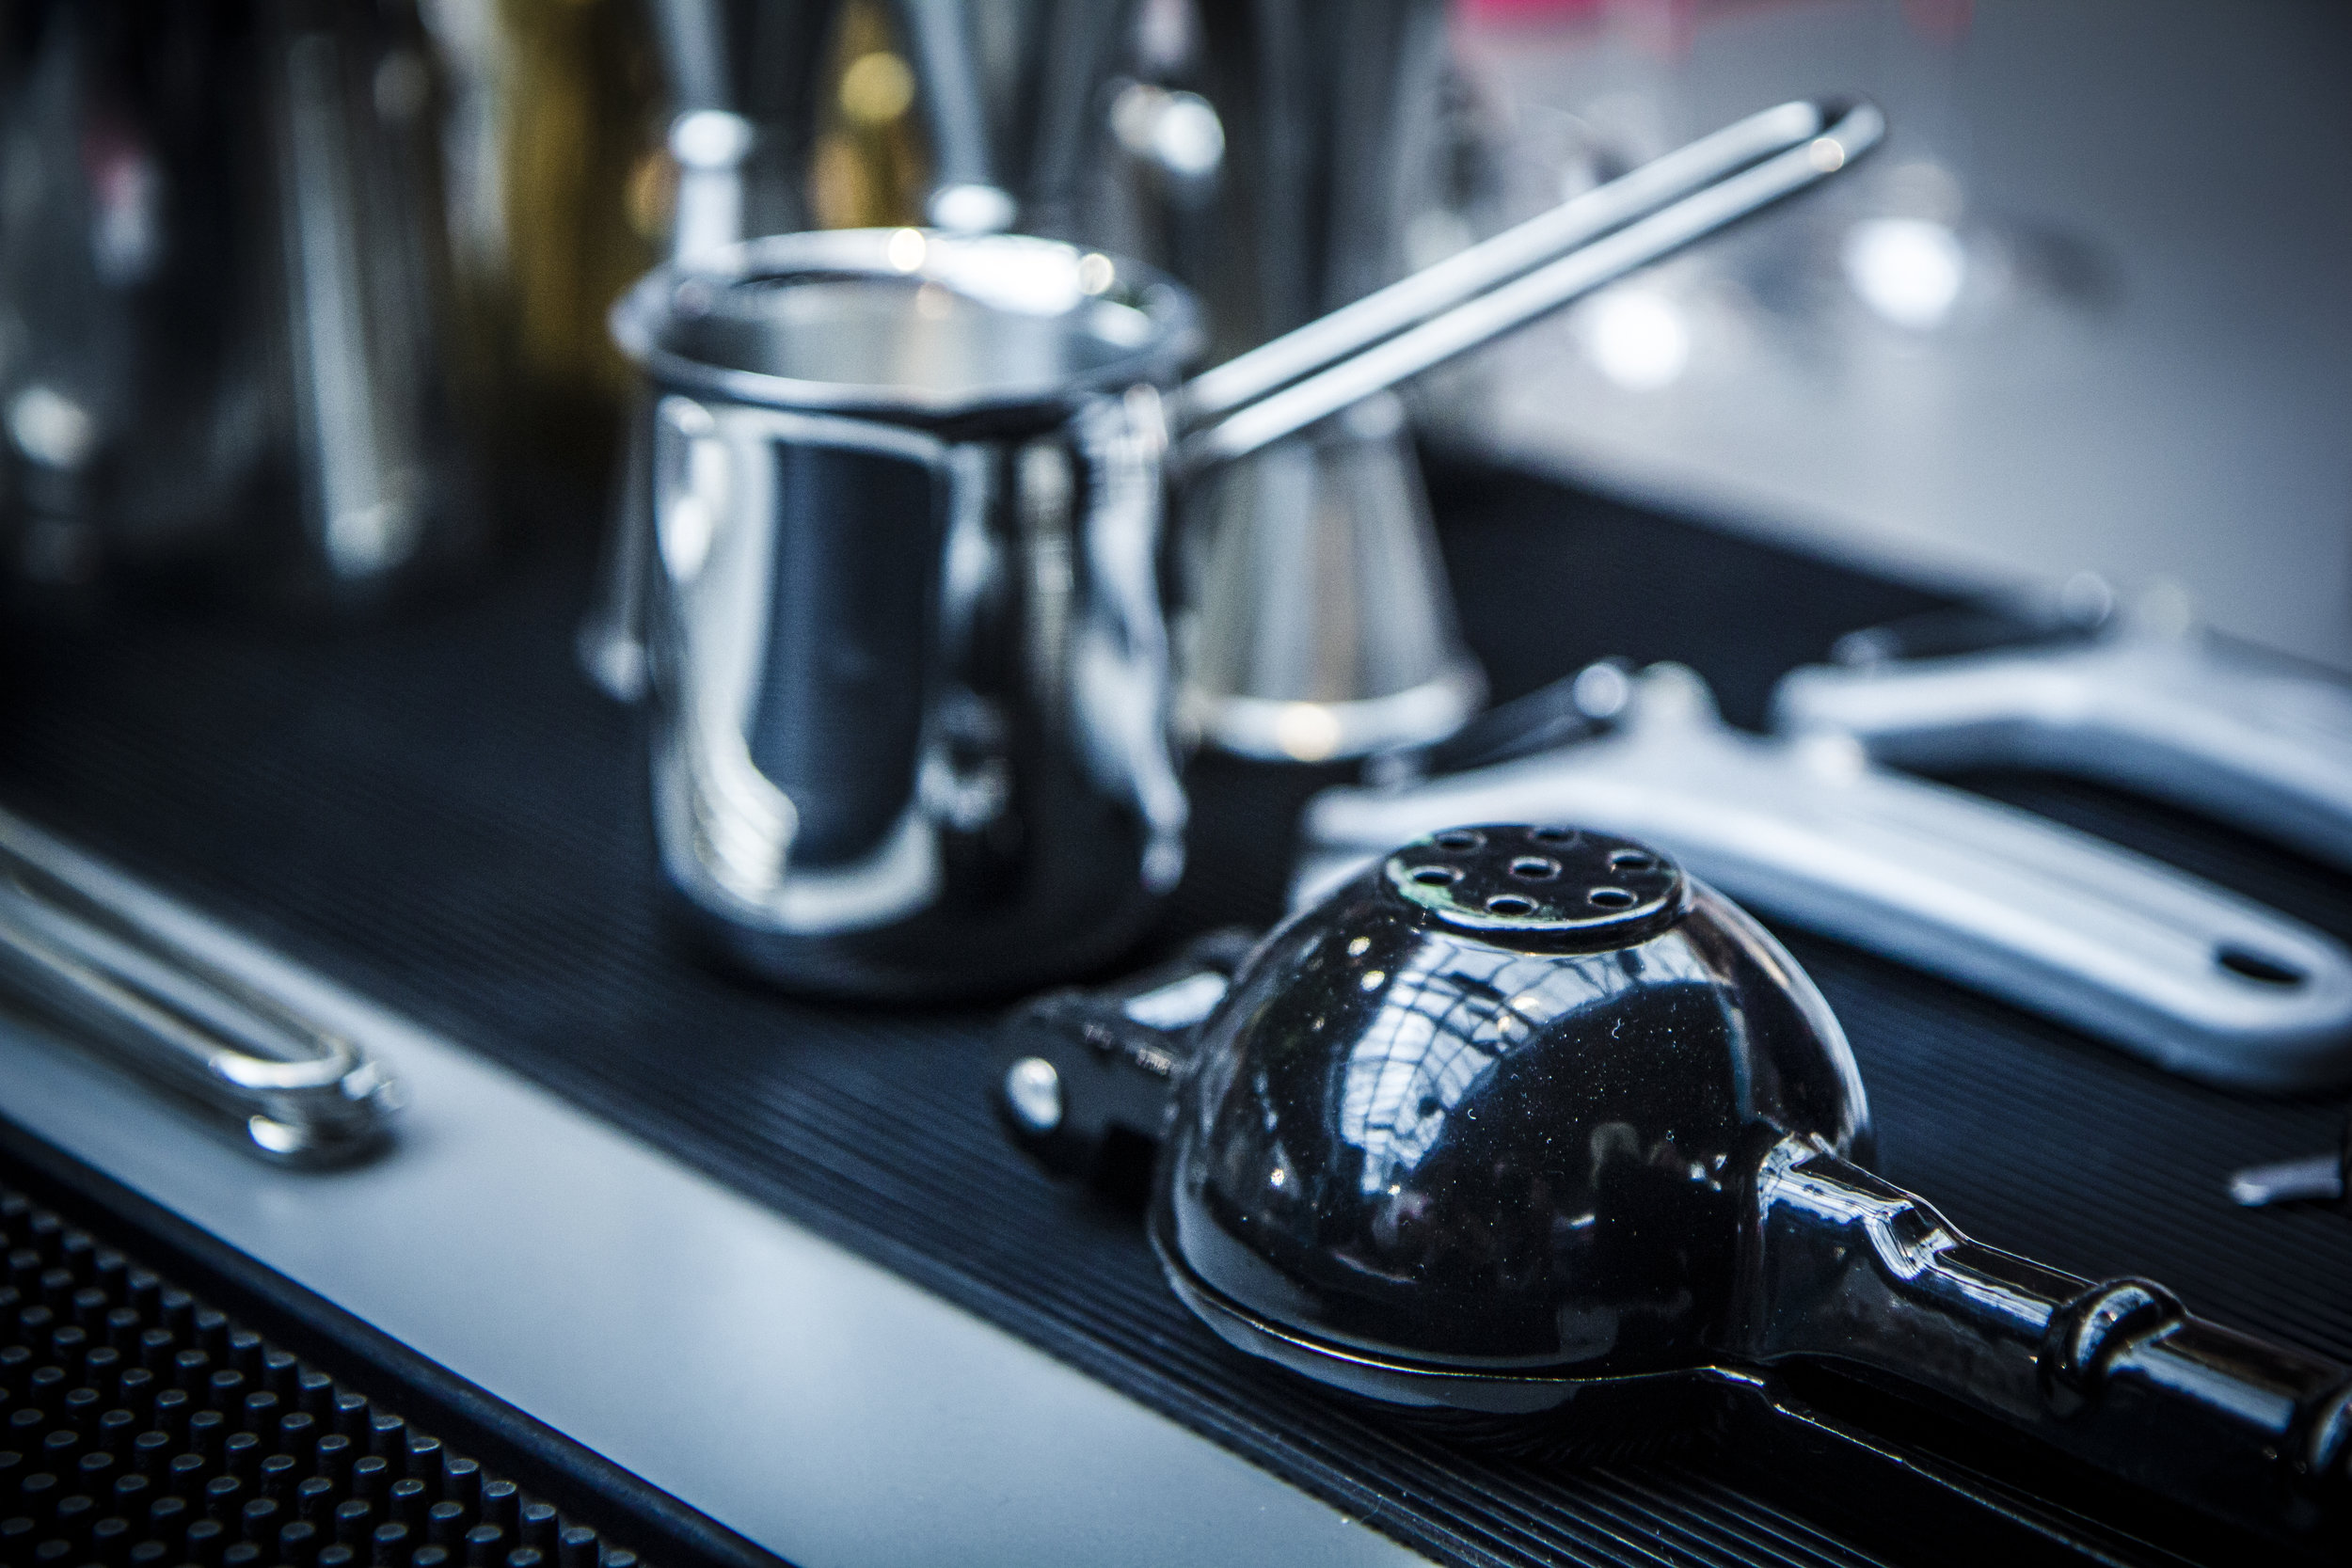 cesare ferrari fotografo berlino luca crinò mixology cocktail